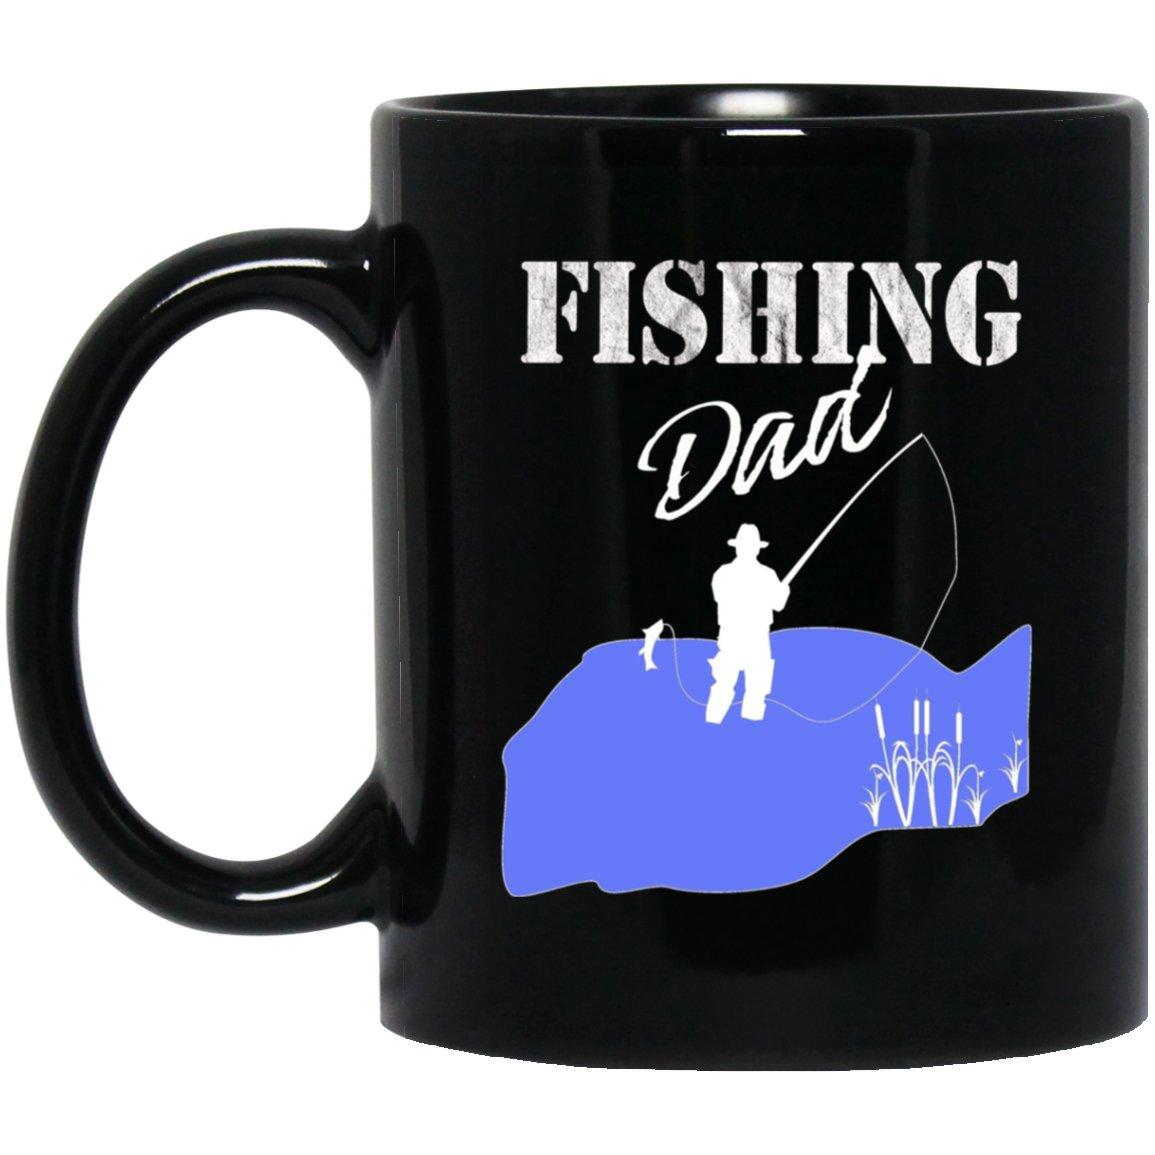 Mens Fishing Dad Fisherman Father Gift Black  Mug Black Ceramic 11oz Coffee Tea Cup